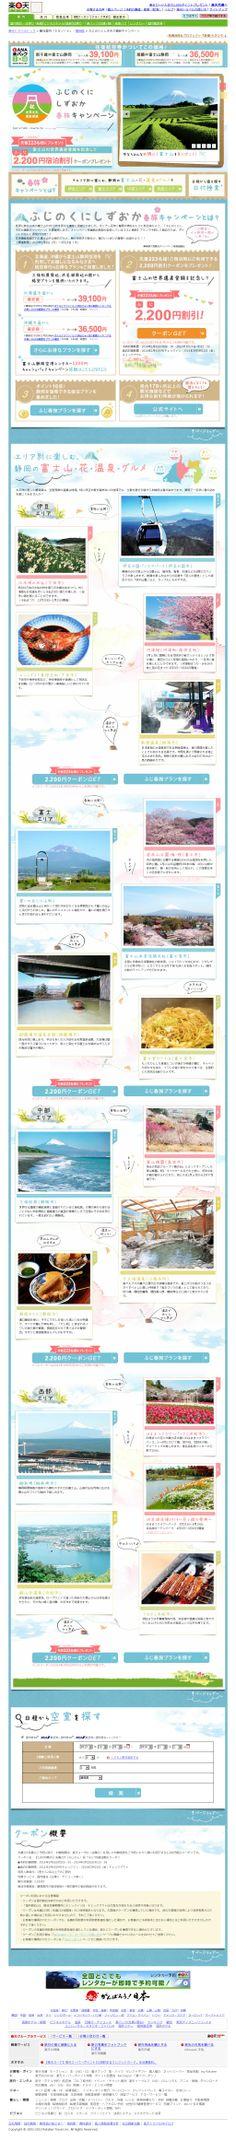 2013/12/24【D】静岡県県観光協会